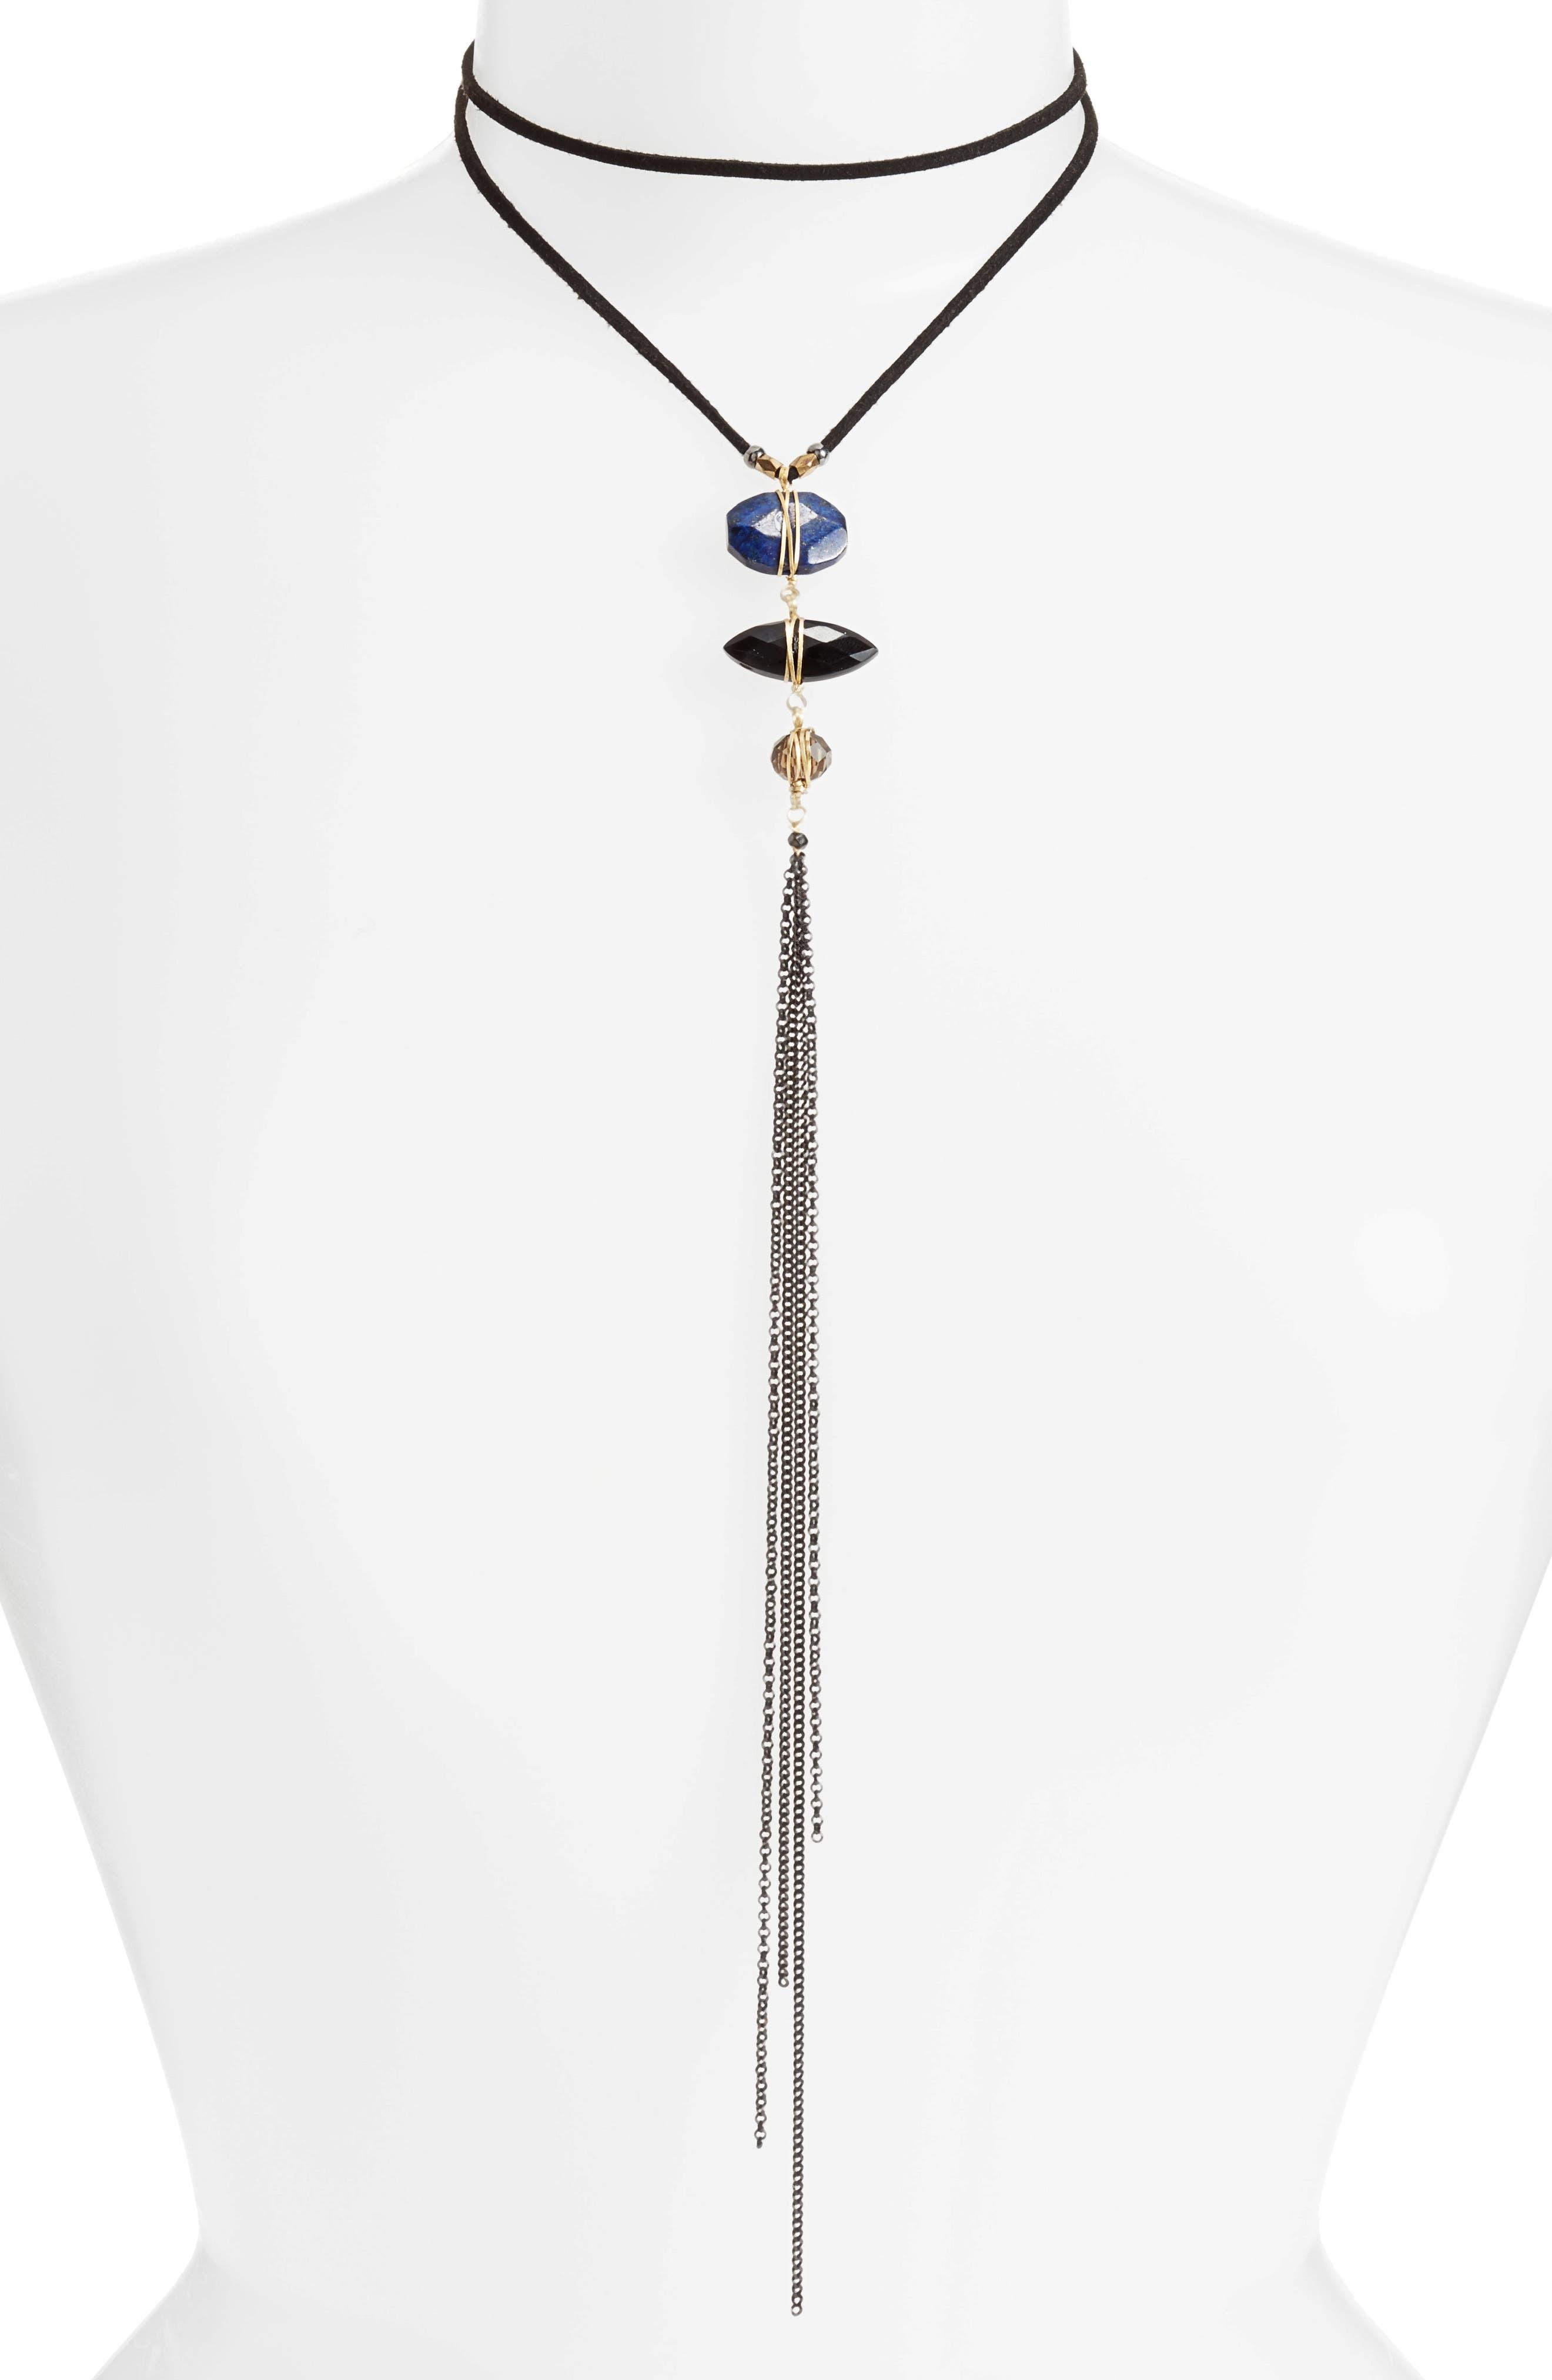 Main Image - Nakamol Design Lapis, Agate, Quartz & Crystal Y Necklace